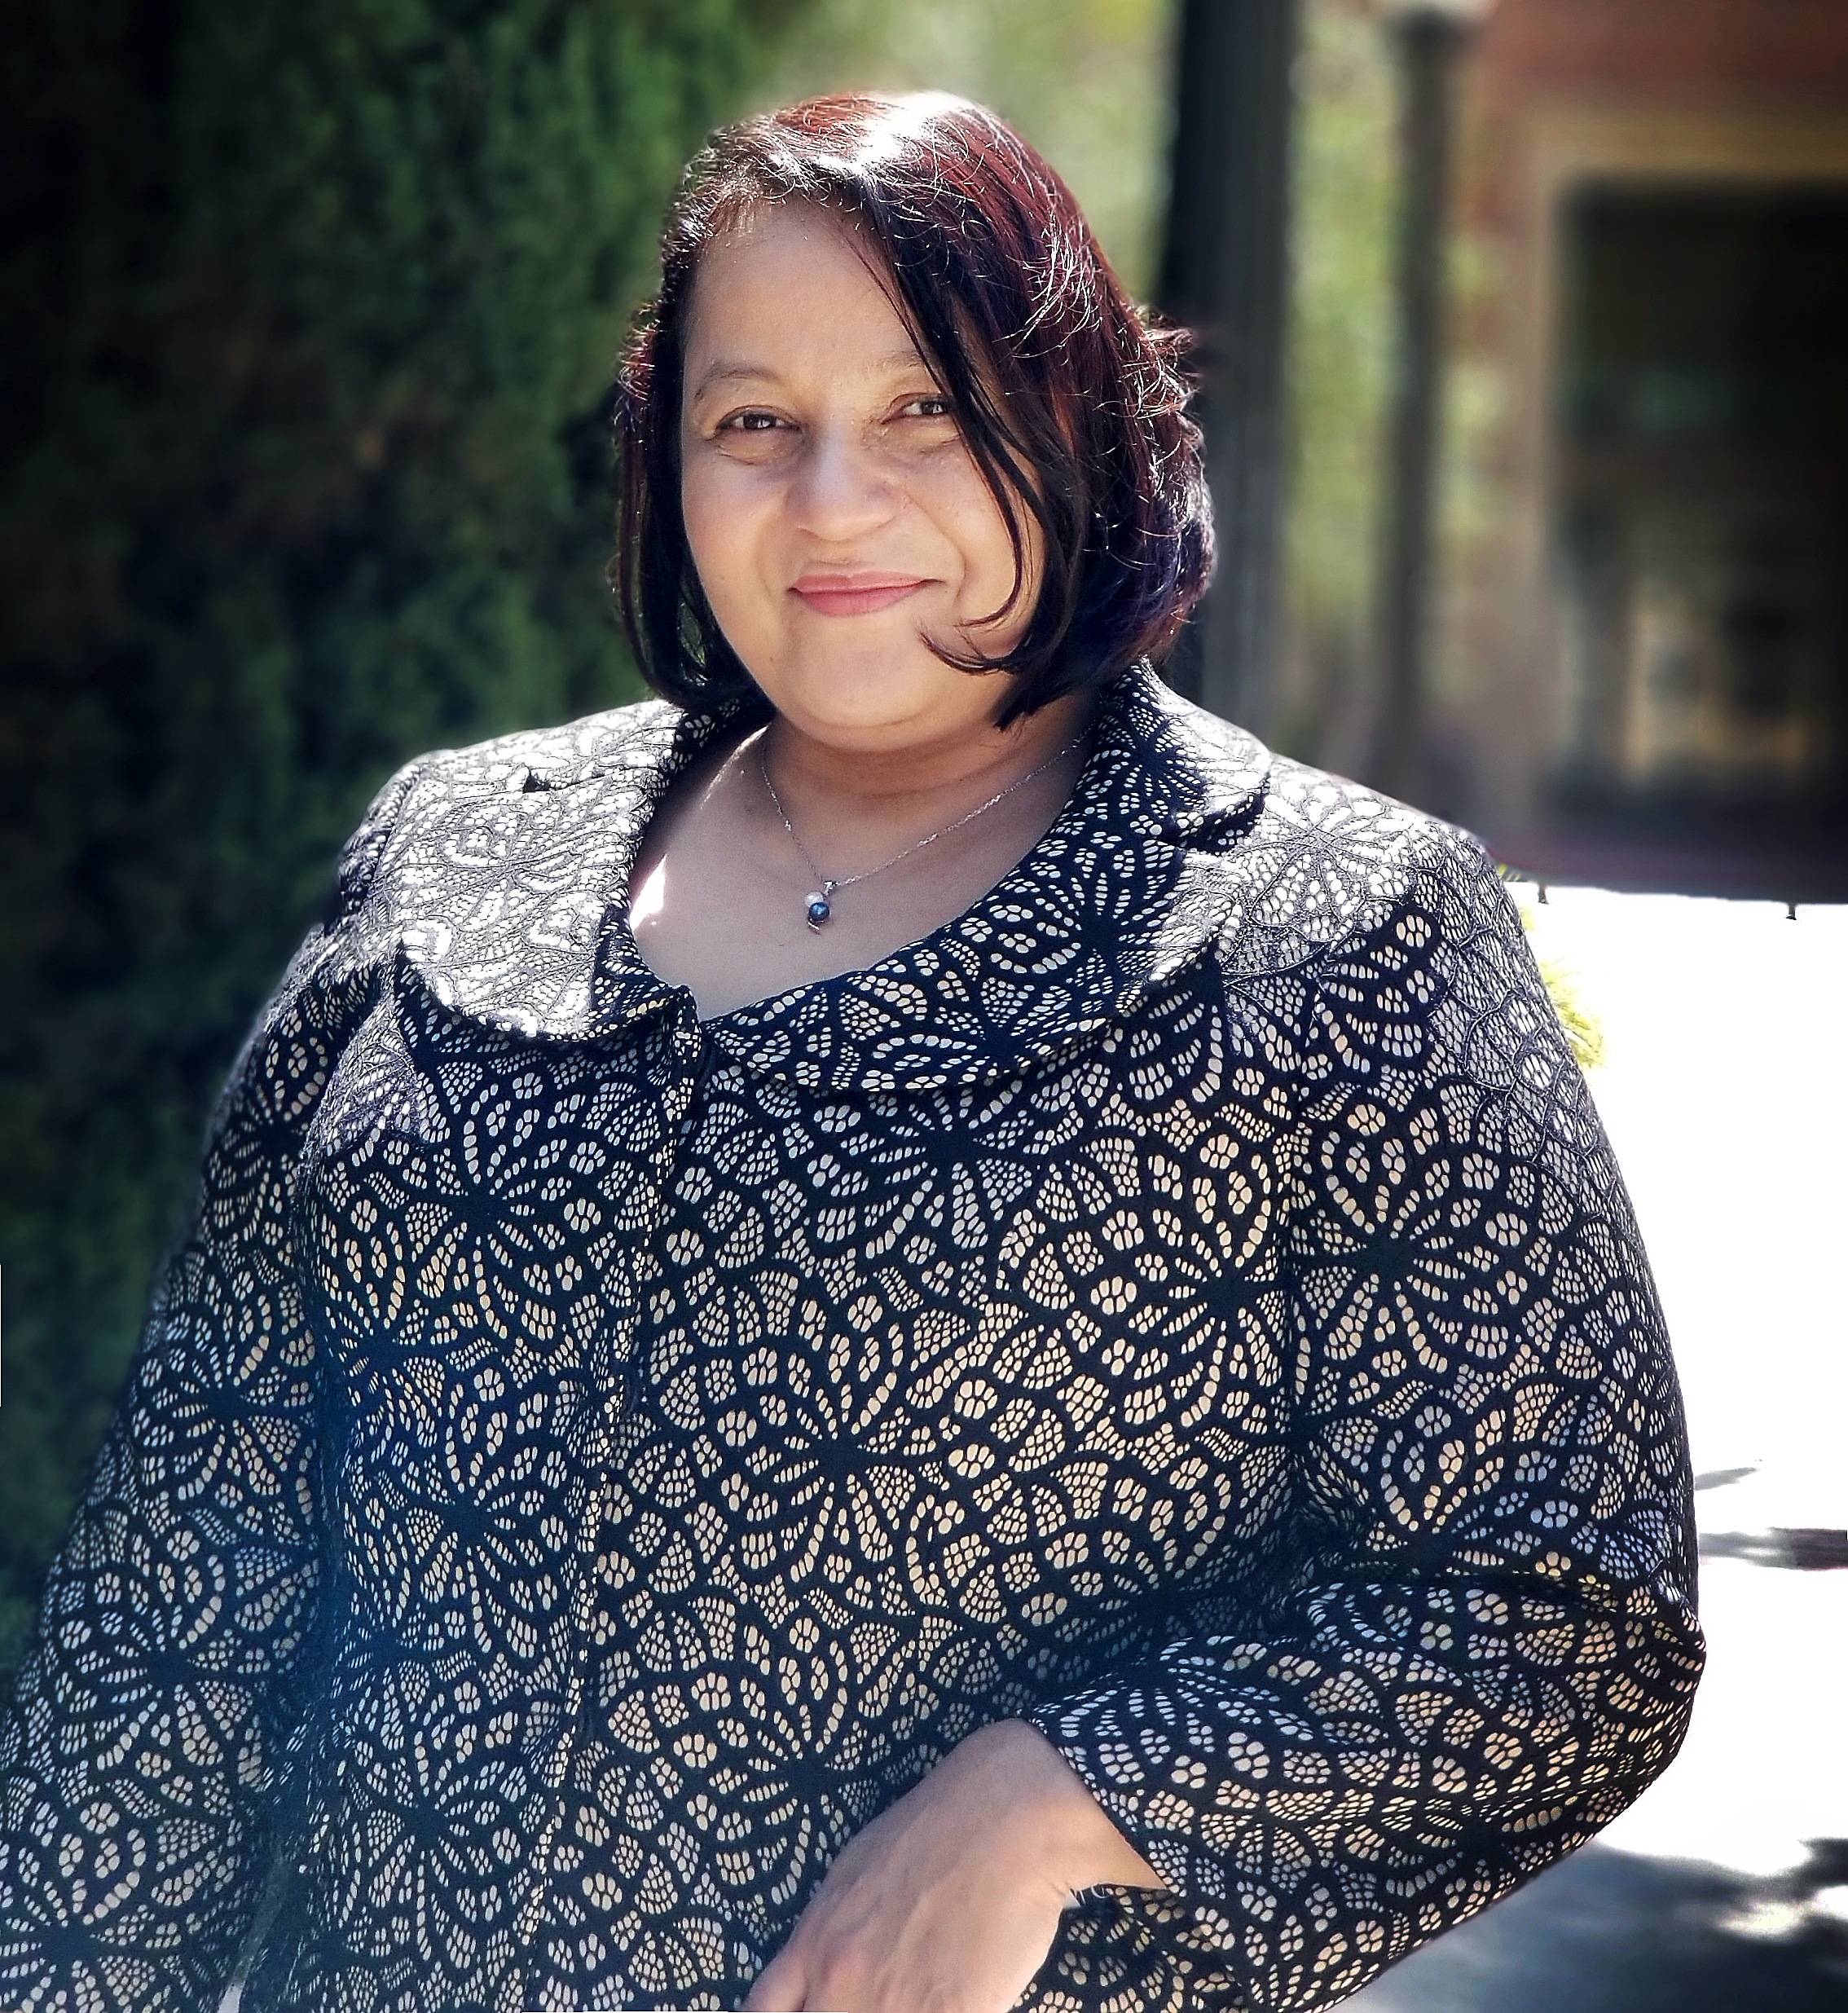 A photo of Norma Mendoza-Dutton.